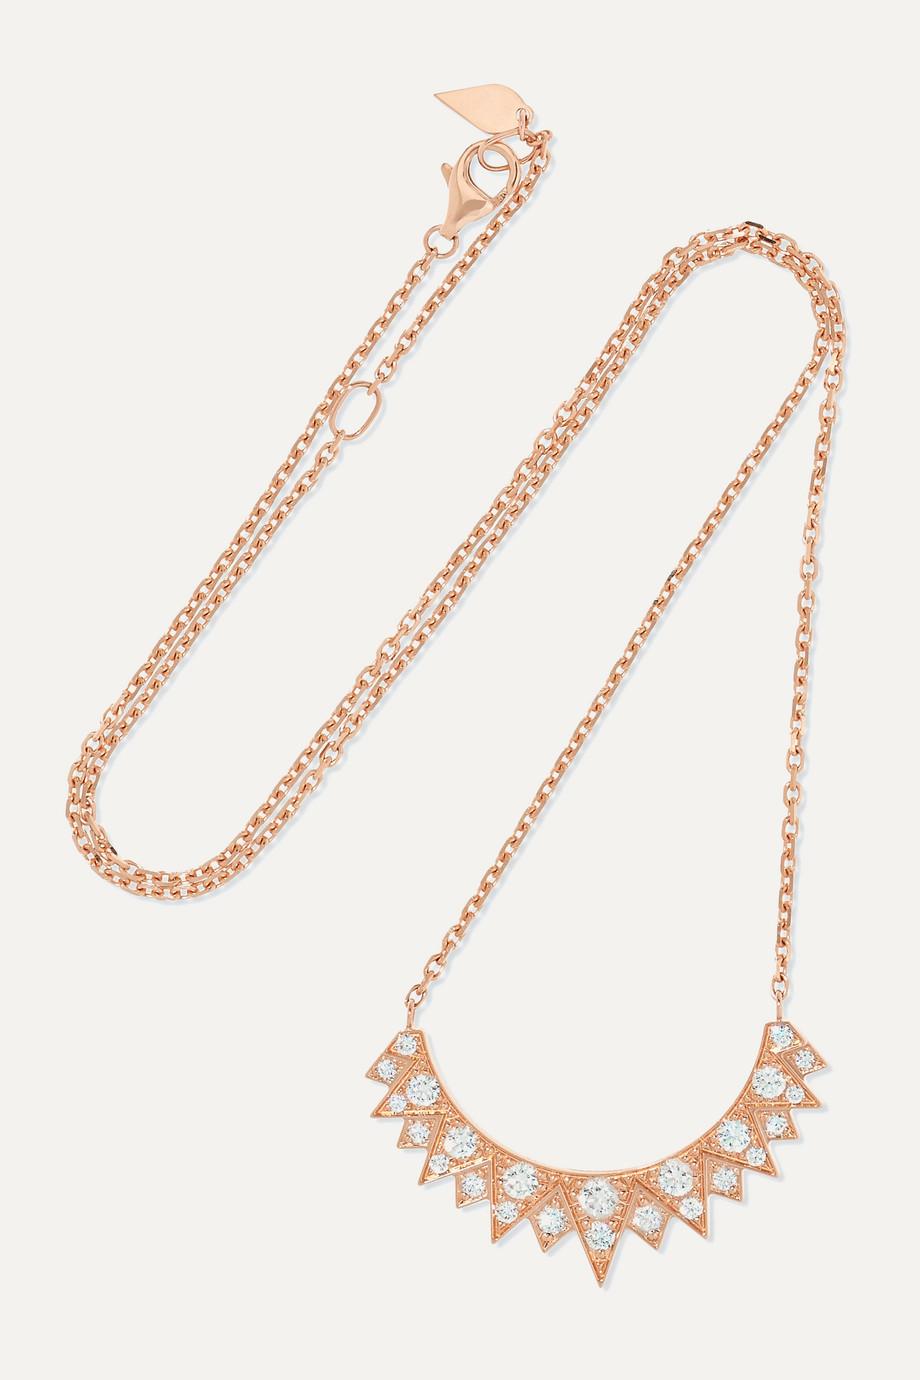 Piaget Sunlight 18-karat rose gold diamond necklace